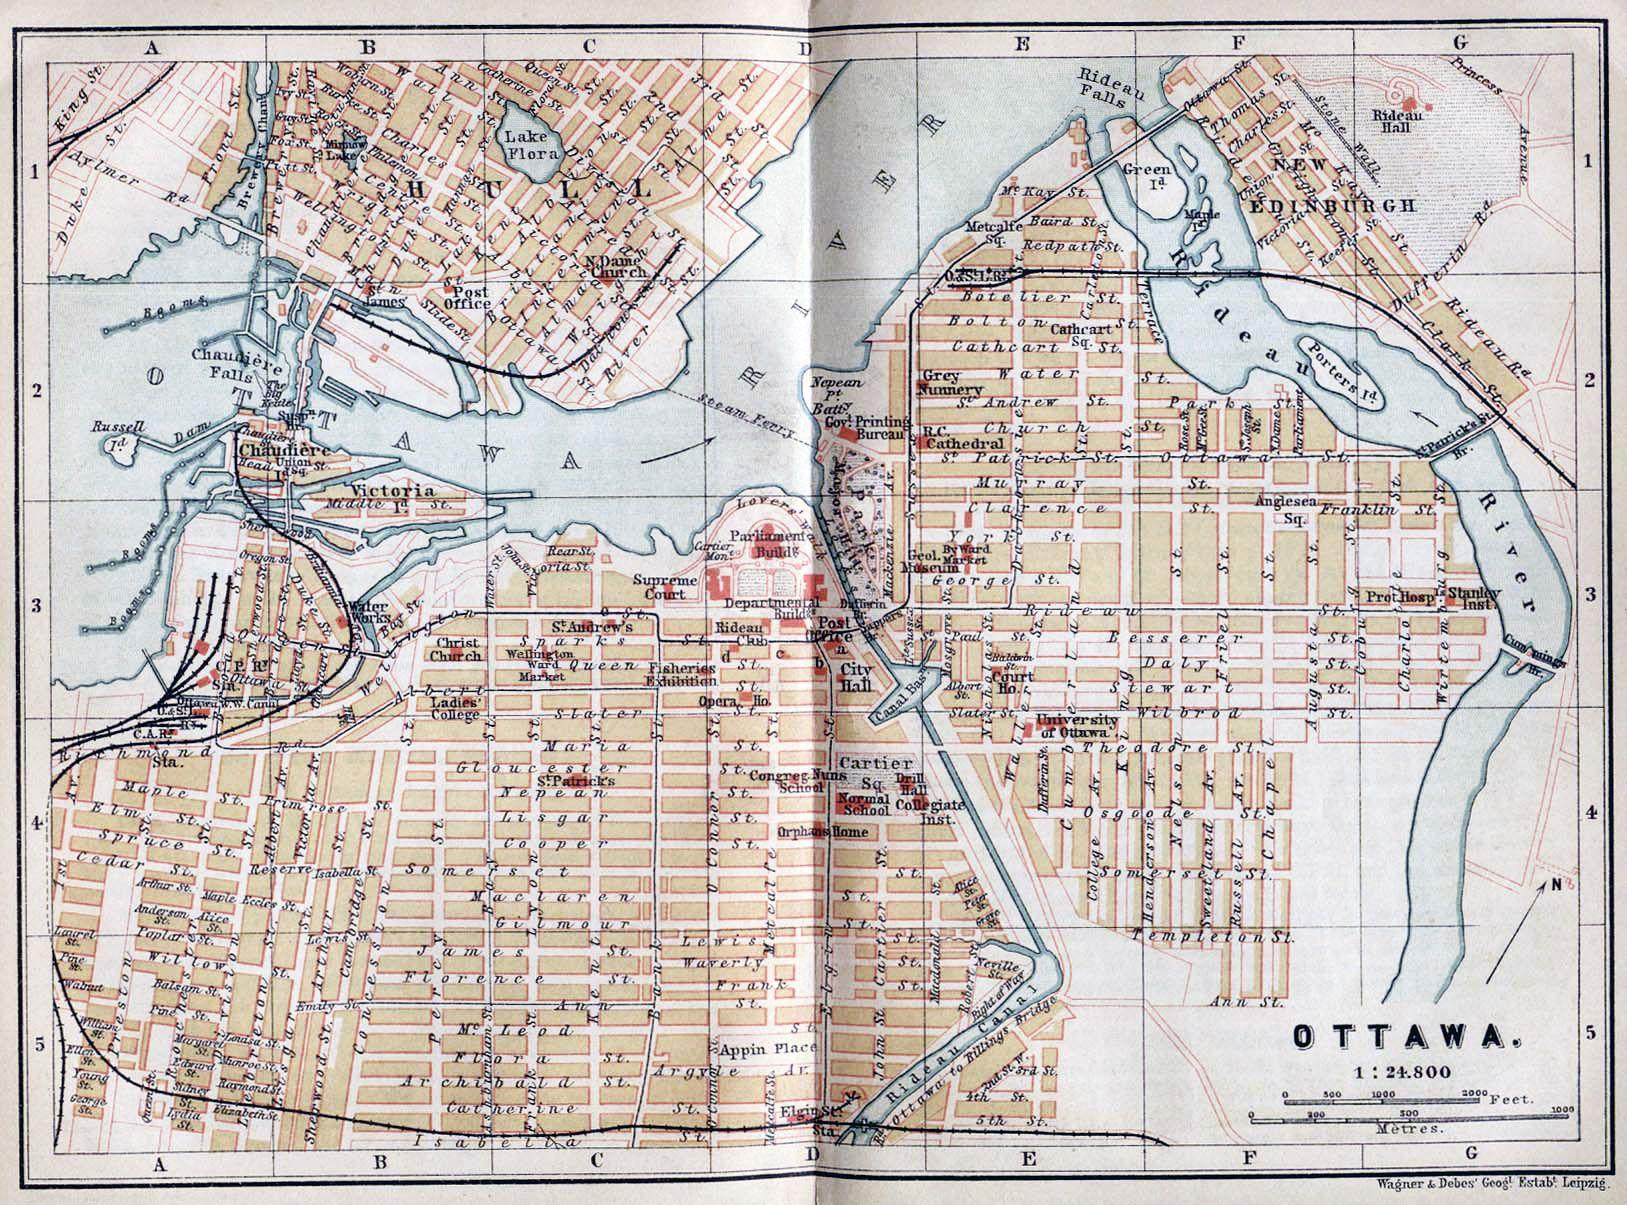 ottawa old pictures | Large old road map of Ottawa – 1894 ... on niagara falls, map of grande prairie canada, map of us and canada, map of new france canada, map of canada provinces, map of valleyfield canada, map of gaspe canada, map of goose bay canada, map of muskoka canada, map of ontario, nova scotia, quebec city, map of p.e.i. canada, map of cloyne canada, british columbia, map of okanagan valley canada, map of toronto canada, map of canada with cities, map of white rock canada, map of kitchener canada, map of vancouver canada, map of glace bay canada, québec, map of quebec canada, map of washington canada,